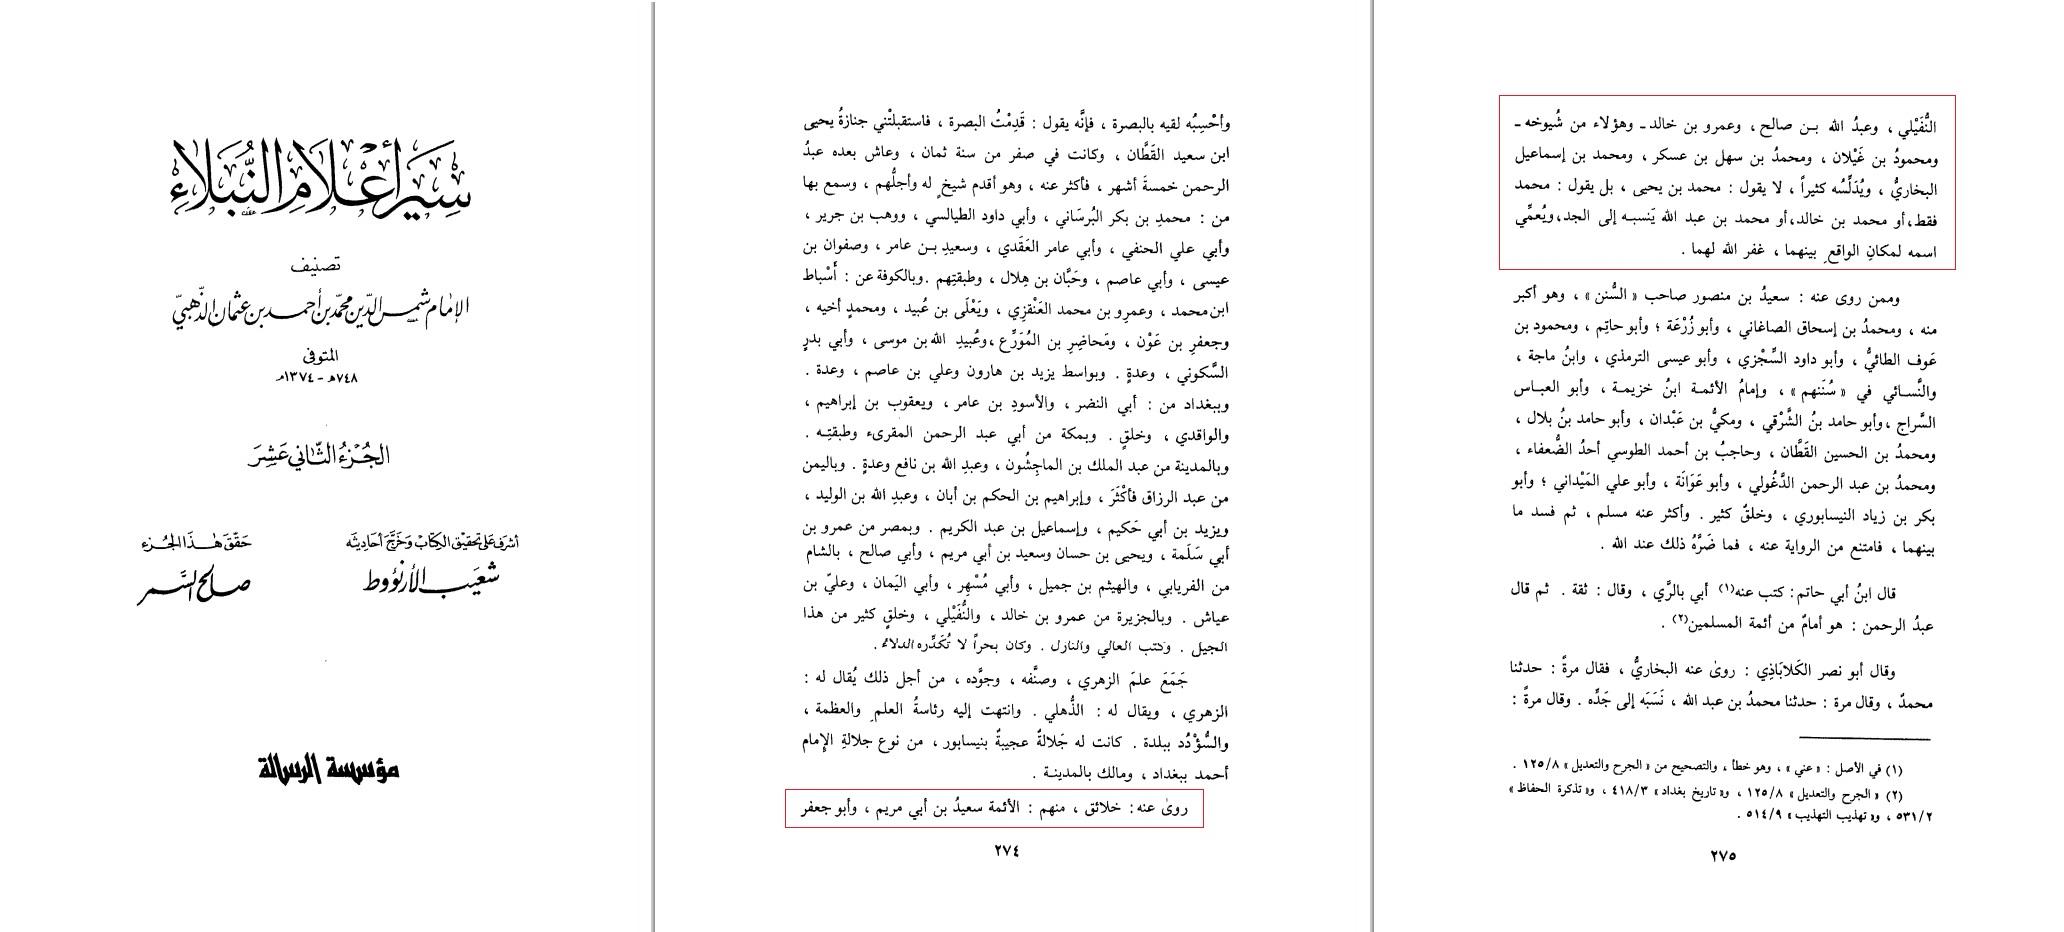 Seyar-e Dhahabi B 13 S 274 - 275